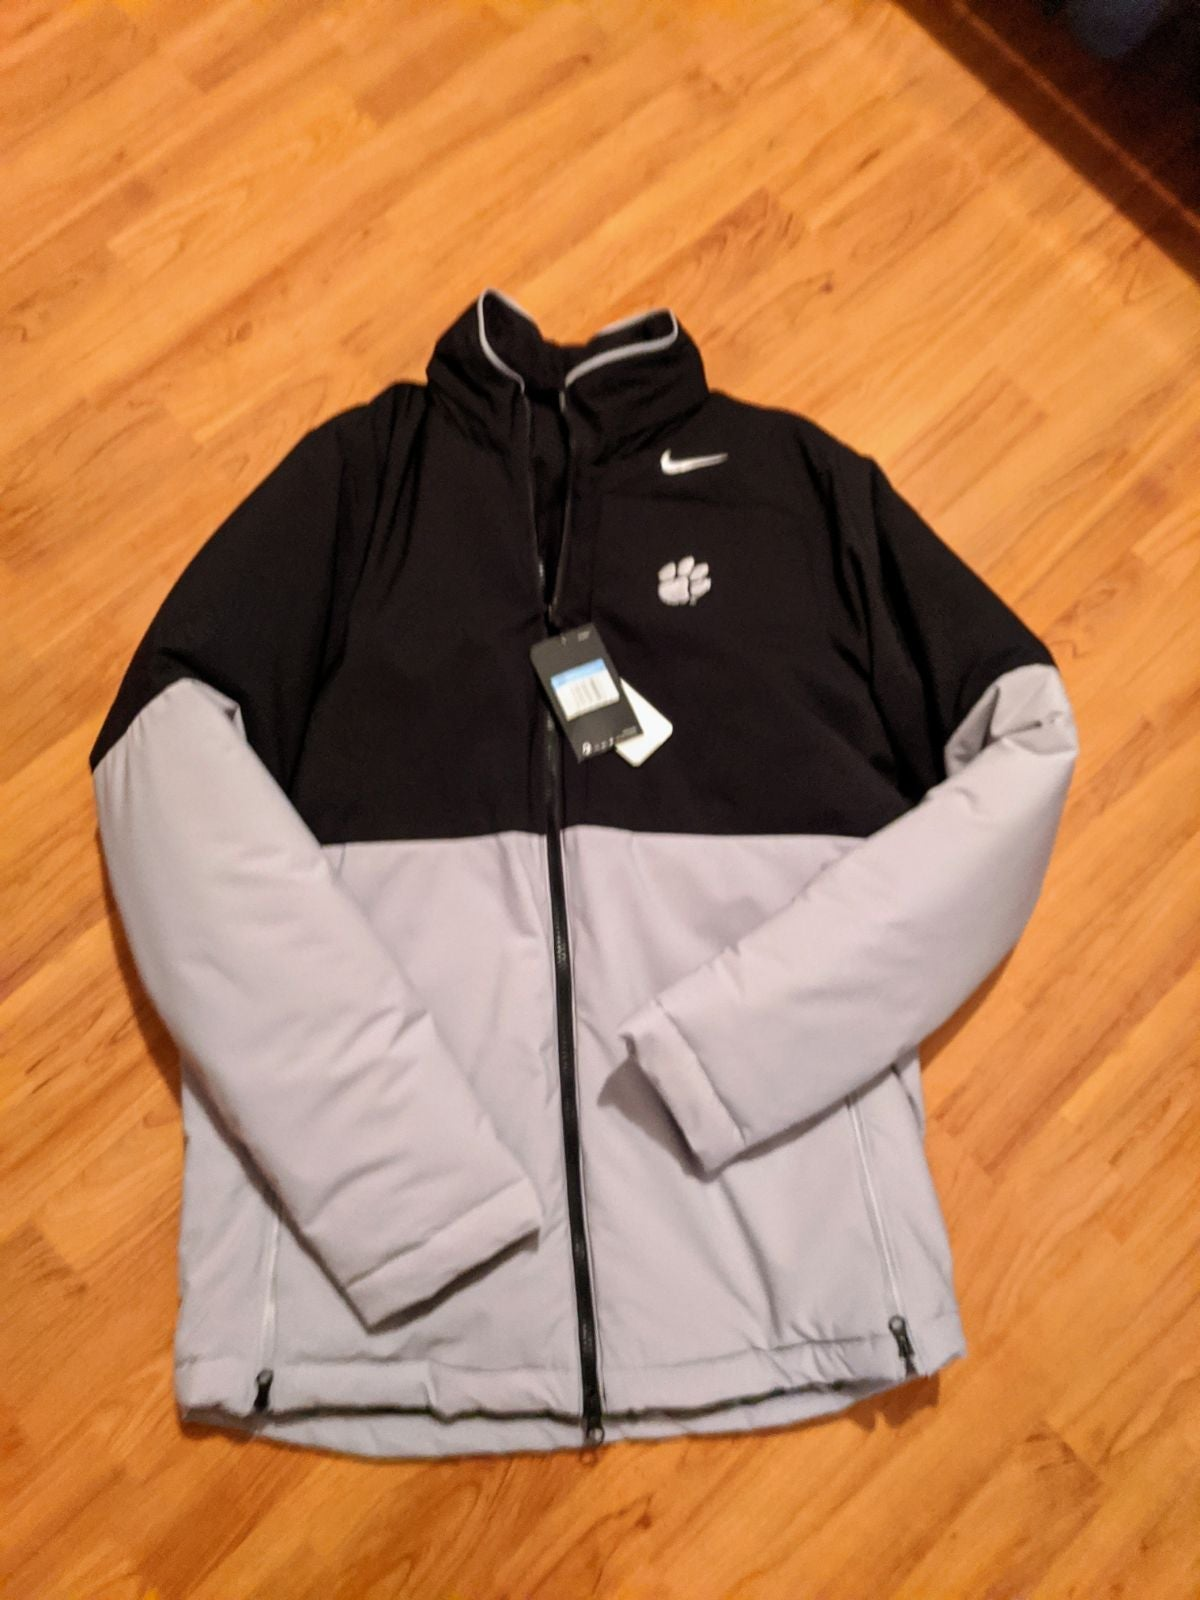 Men's Nike Clemson winter coat size medi